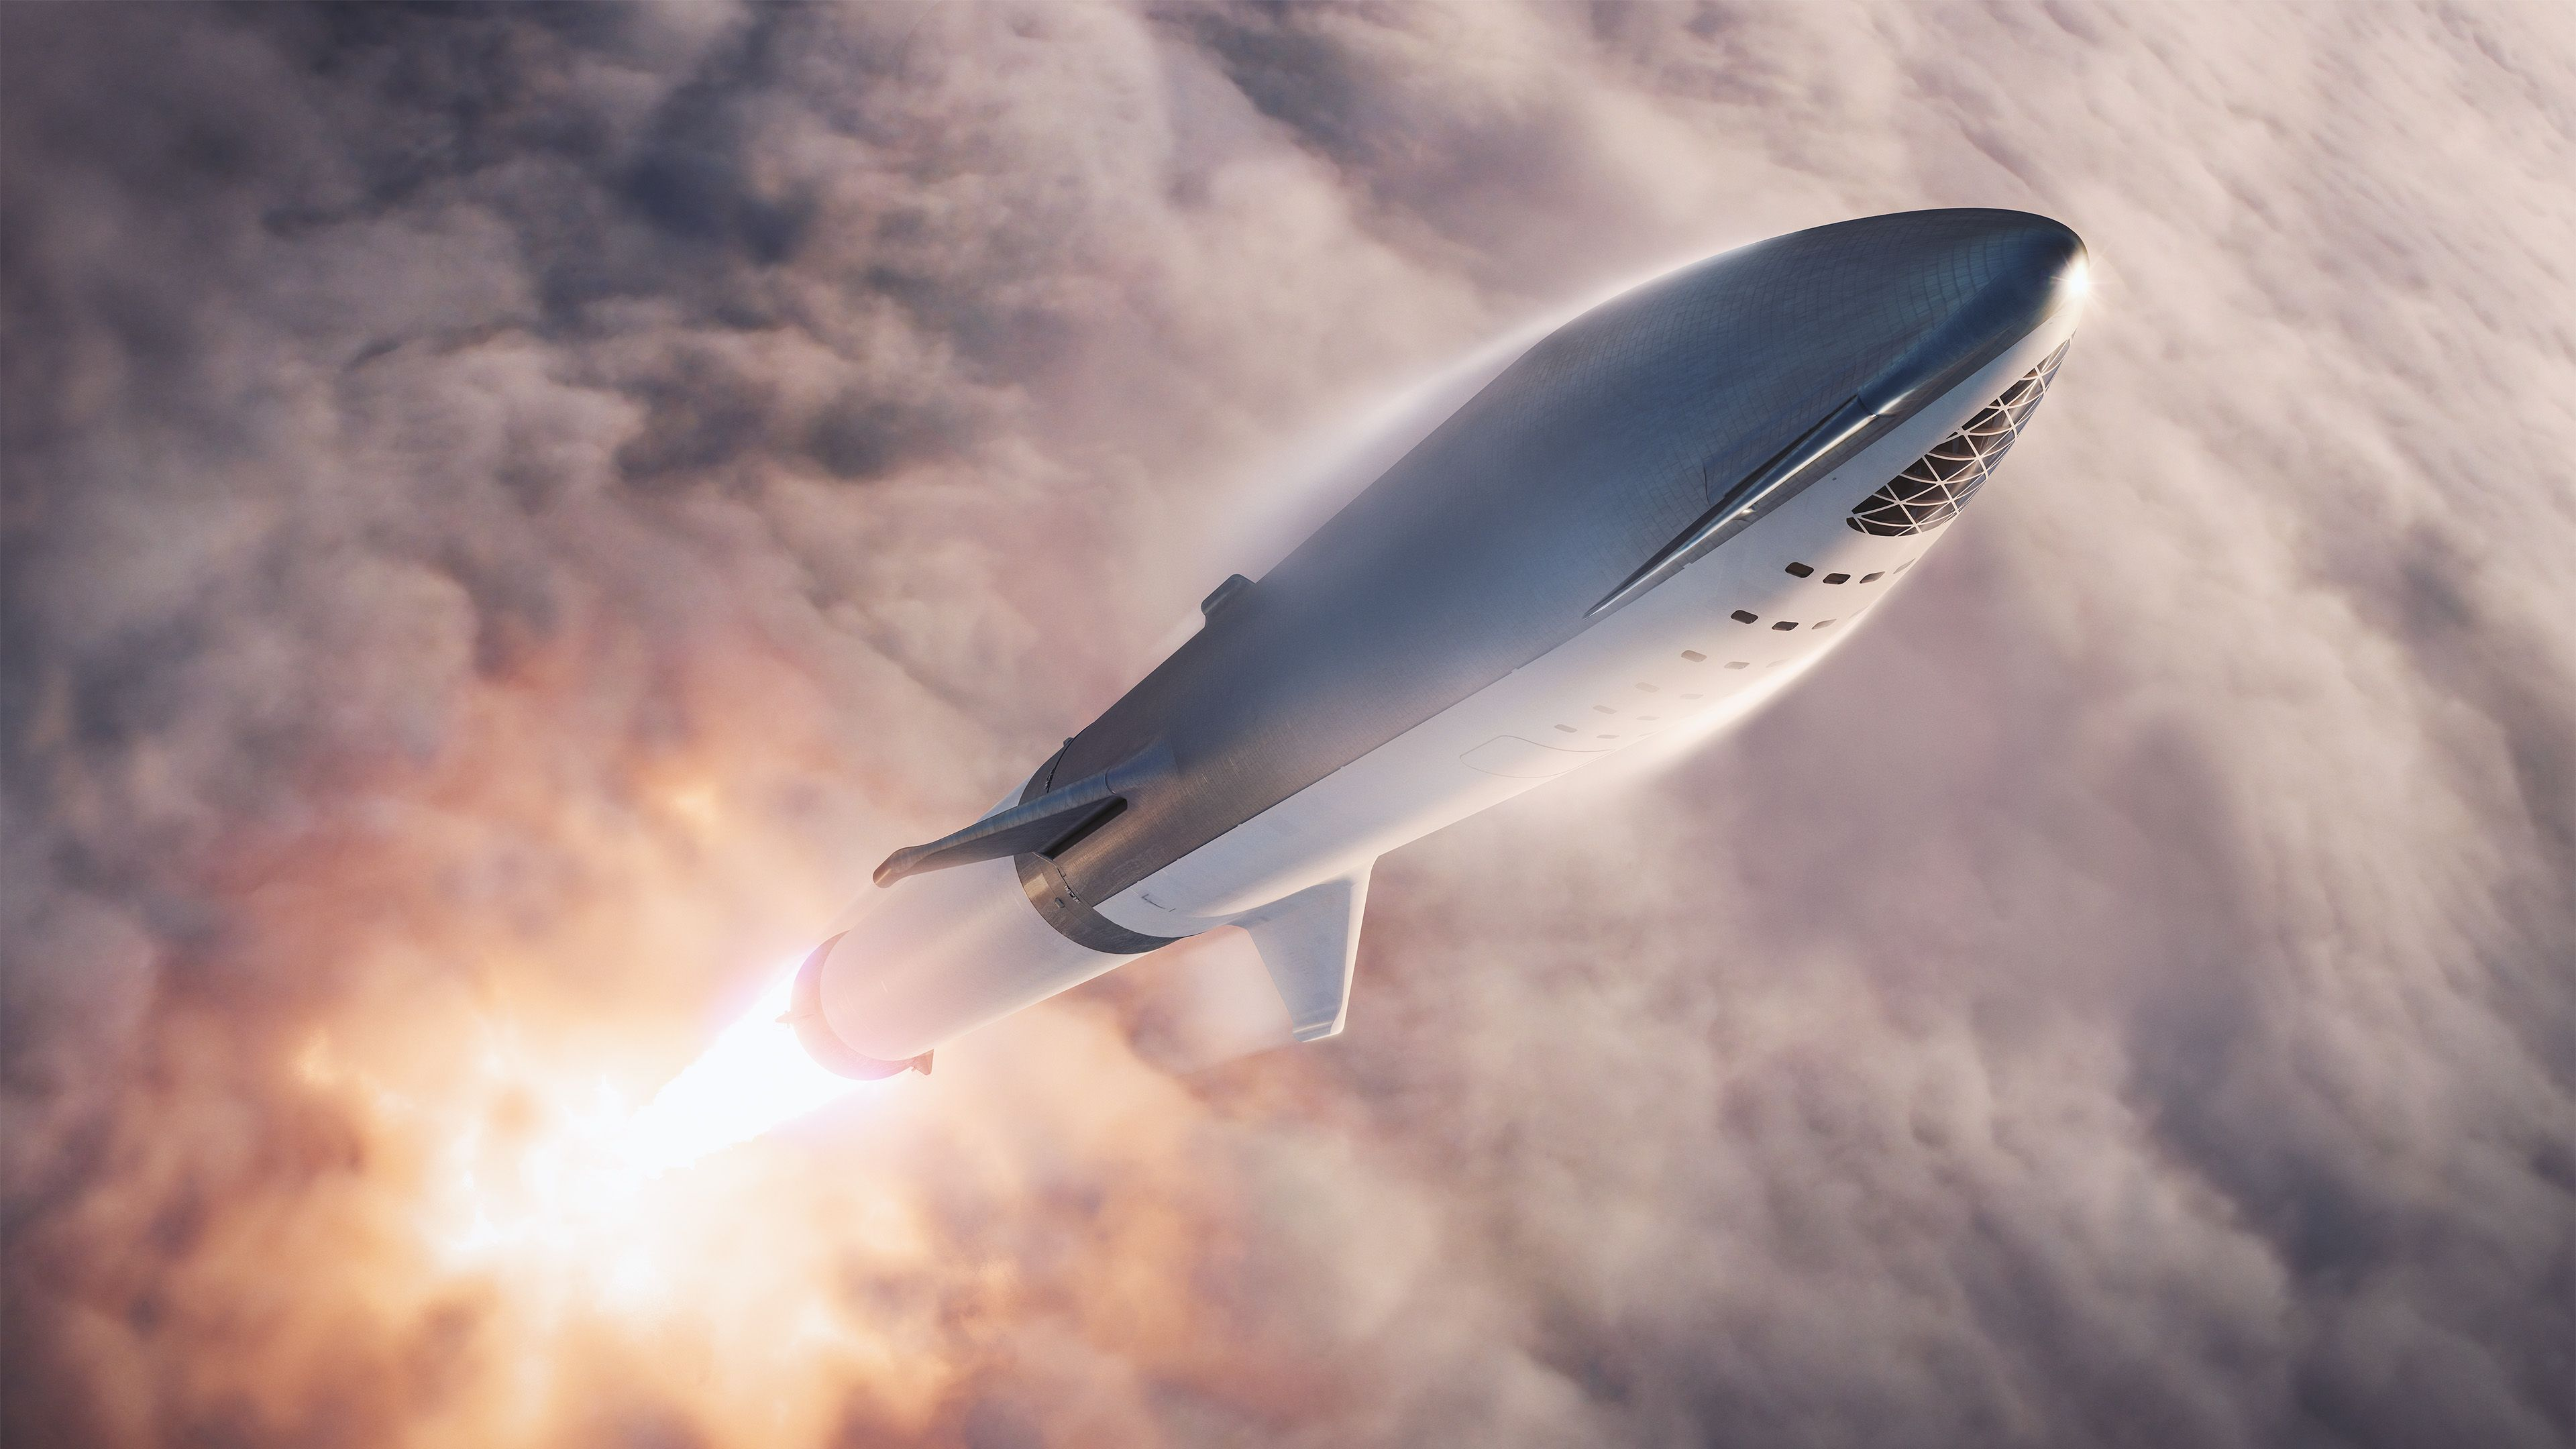 Space X Rocket 4k Spaceship Wallpapers Space X Wallpapers Rocket Wallpapers Hd Wallpapers 4k Wallpapers Spacex Spacex Starship Elon Musk